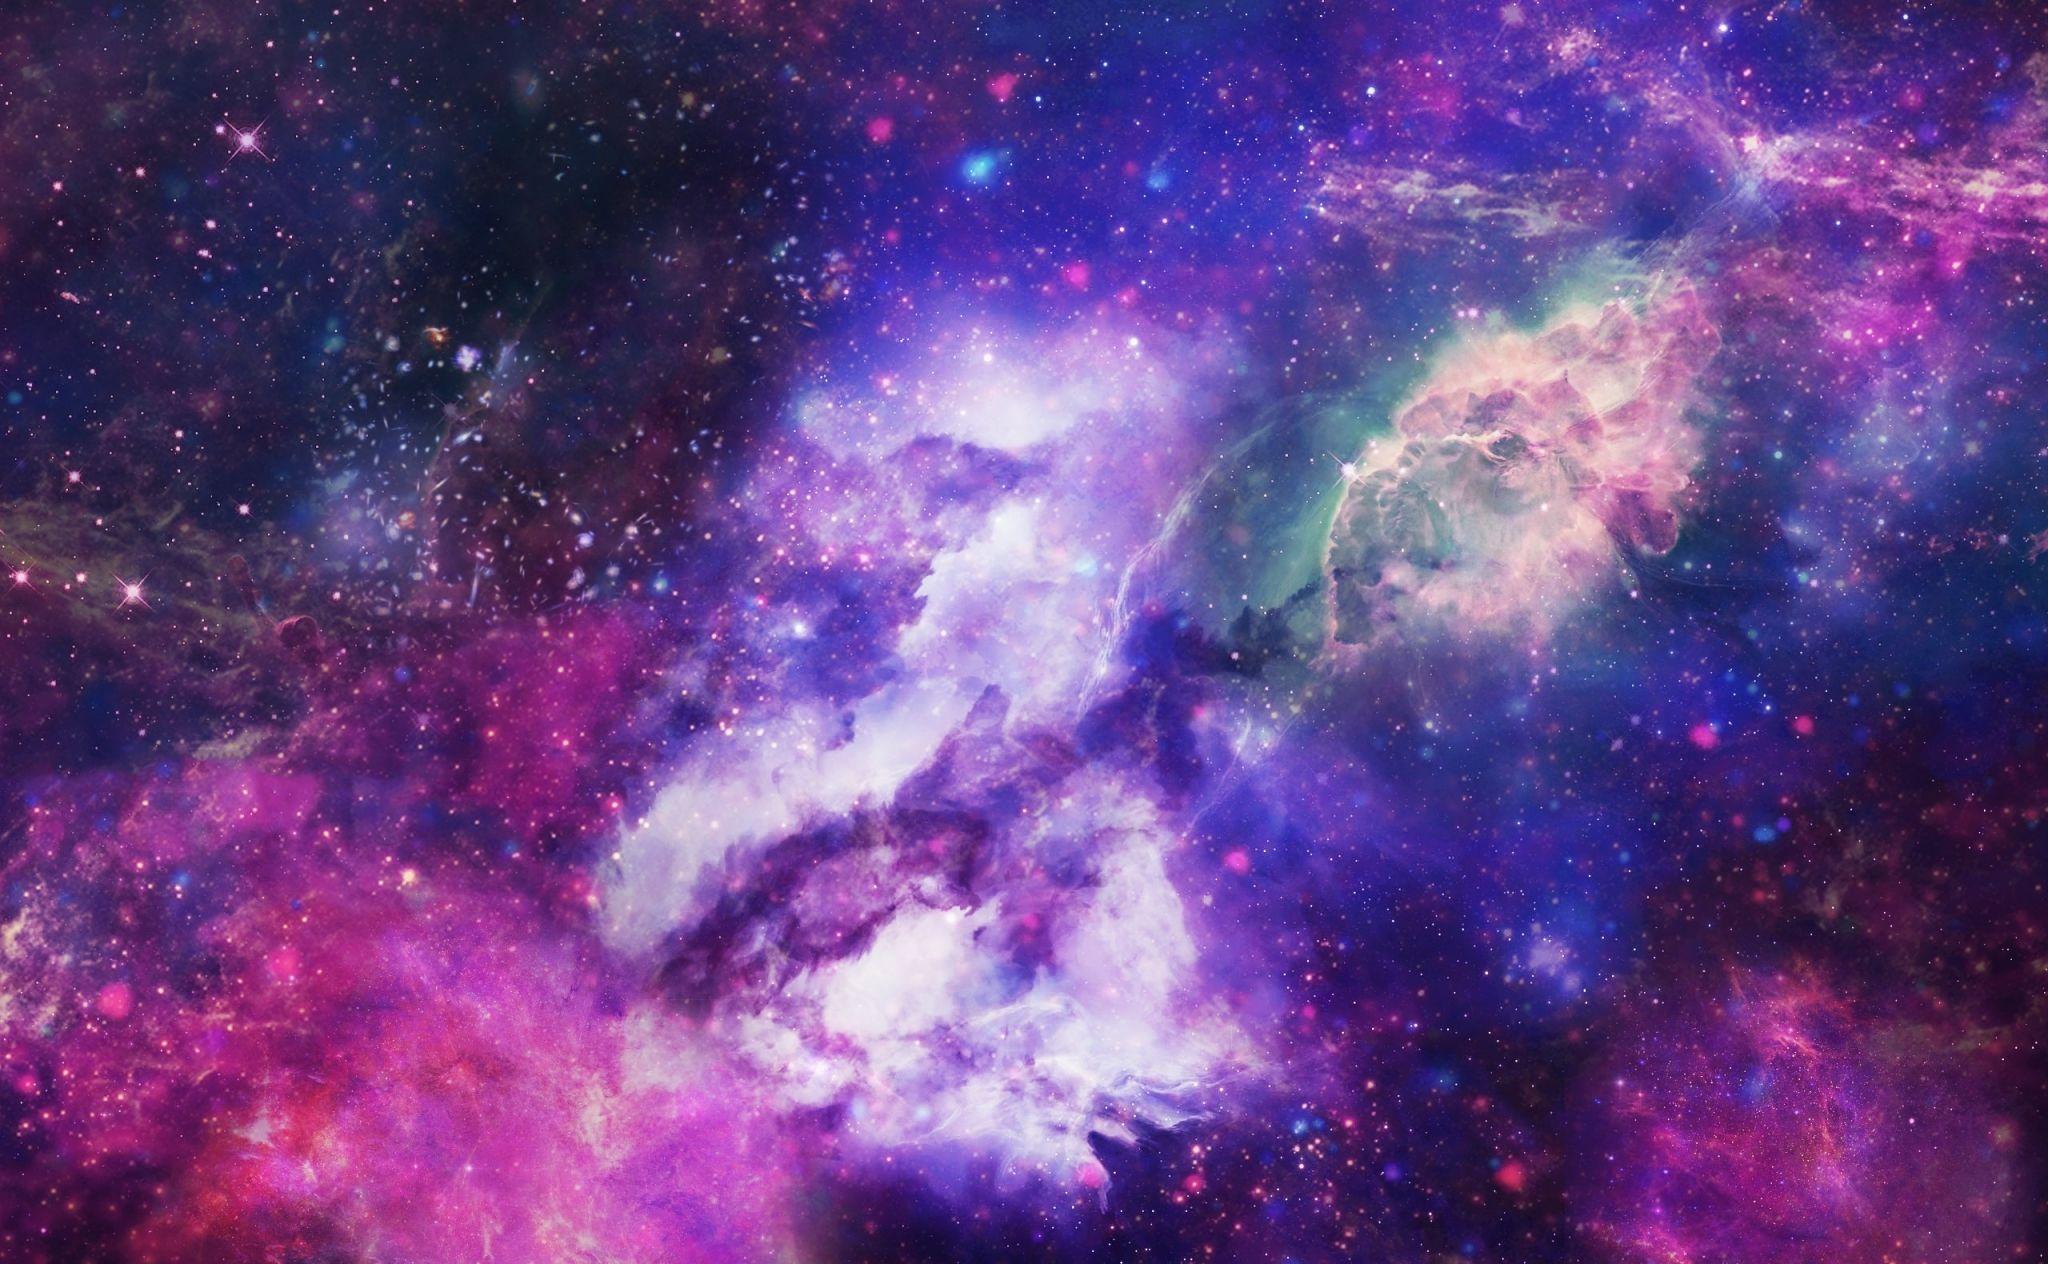 Space Wallpapers For Mac Desktop Galaxy Wallpaper Imac Wallpaper Galaxy Background